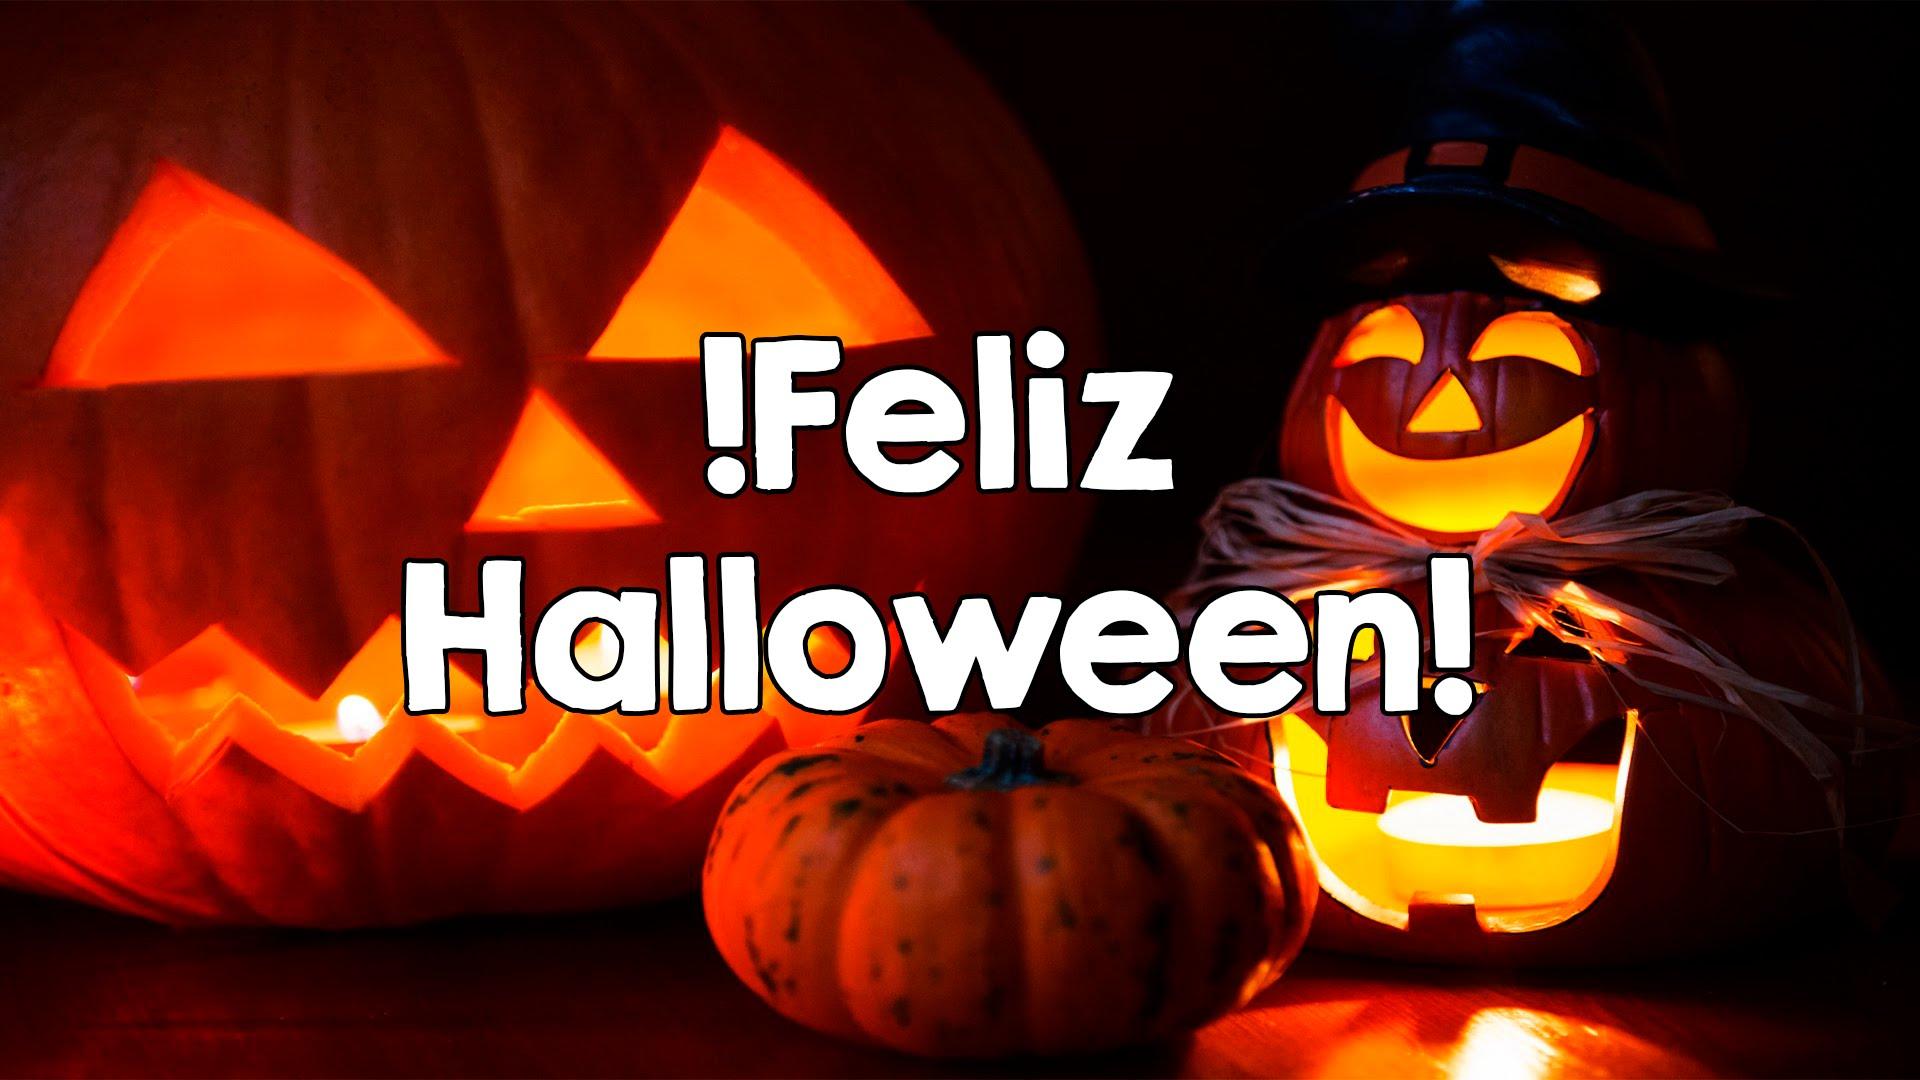 Las Mejores Frases De Halloween 2019 Para Whatsapp Mira